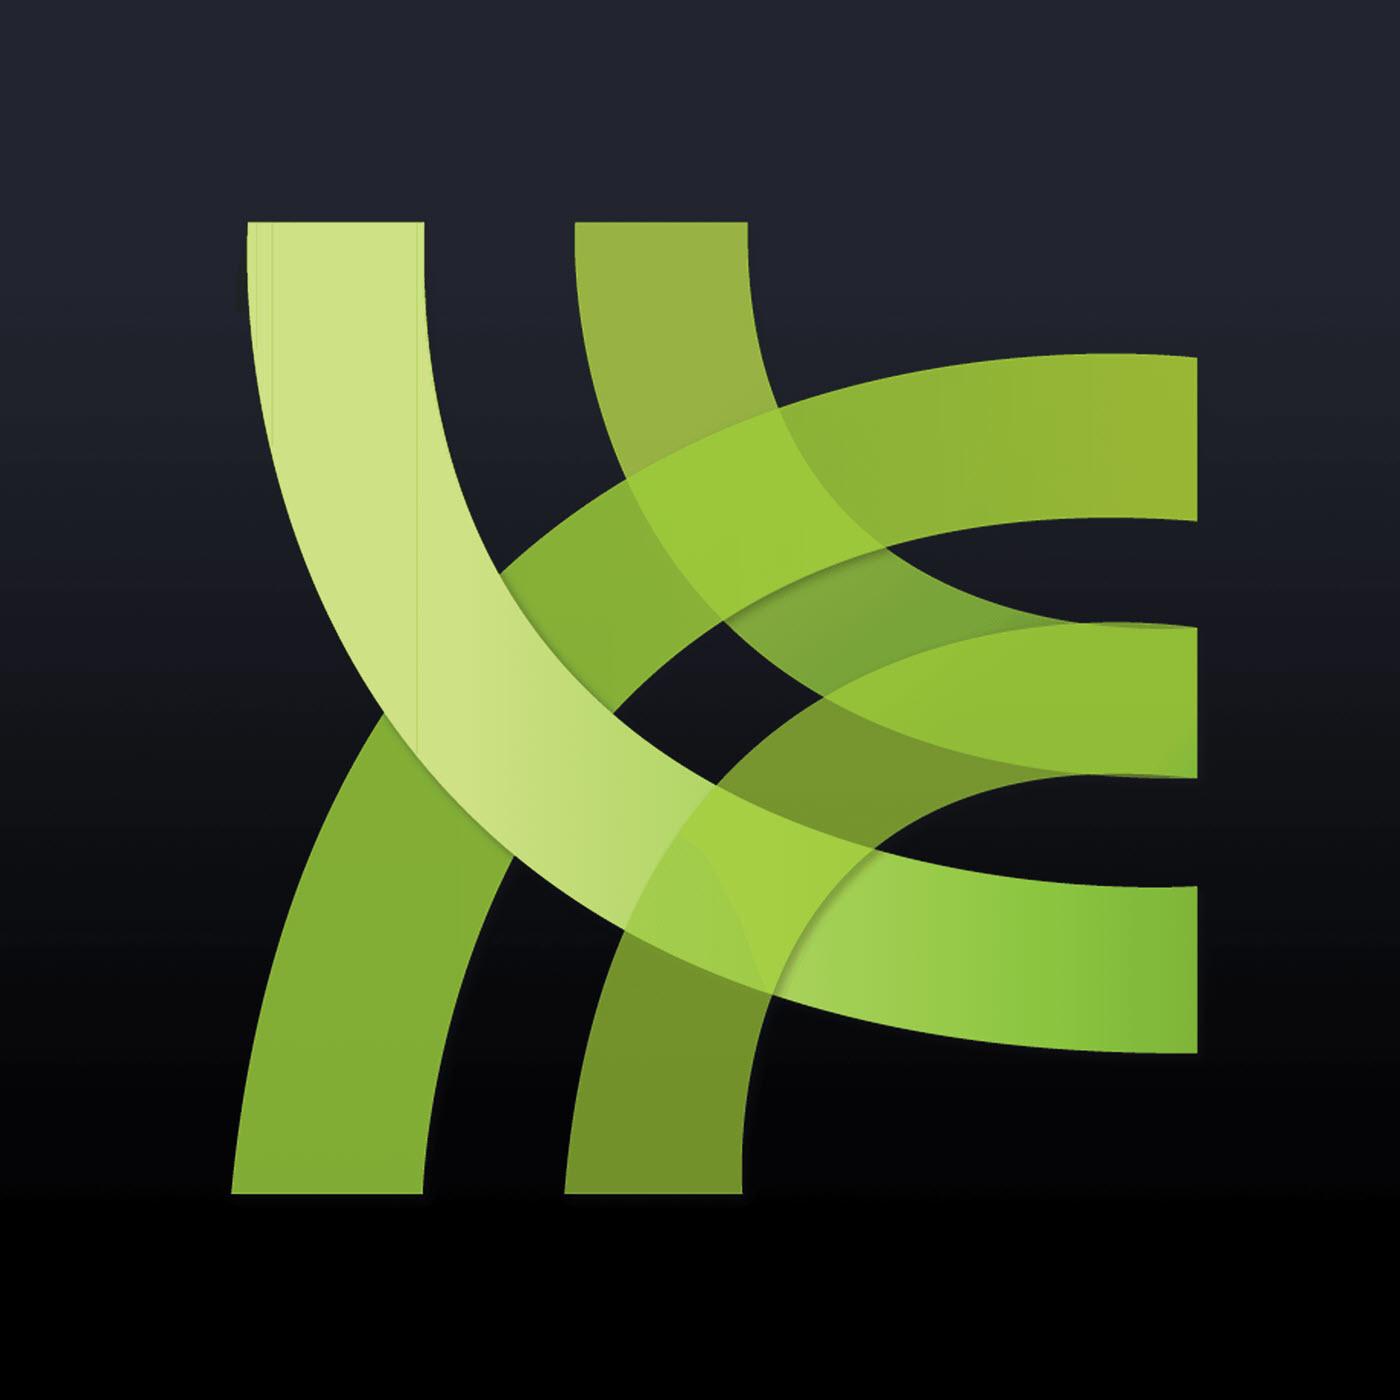 Free Xbox 360 Games Download Full Version Usb Eobd Facile Premium Android Cracked